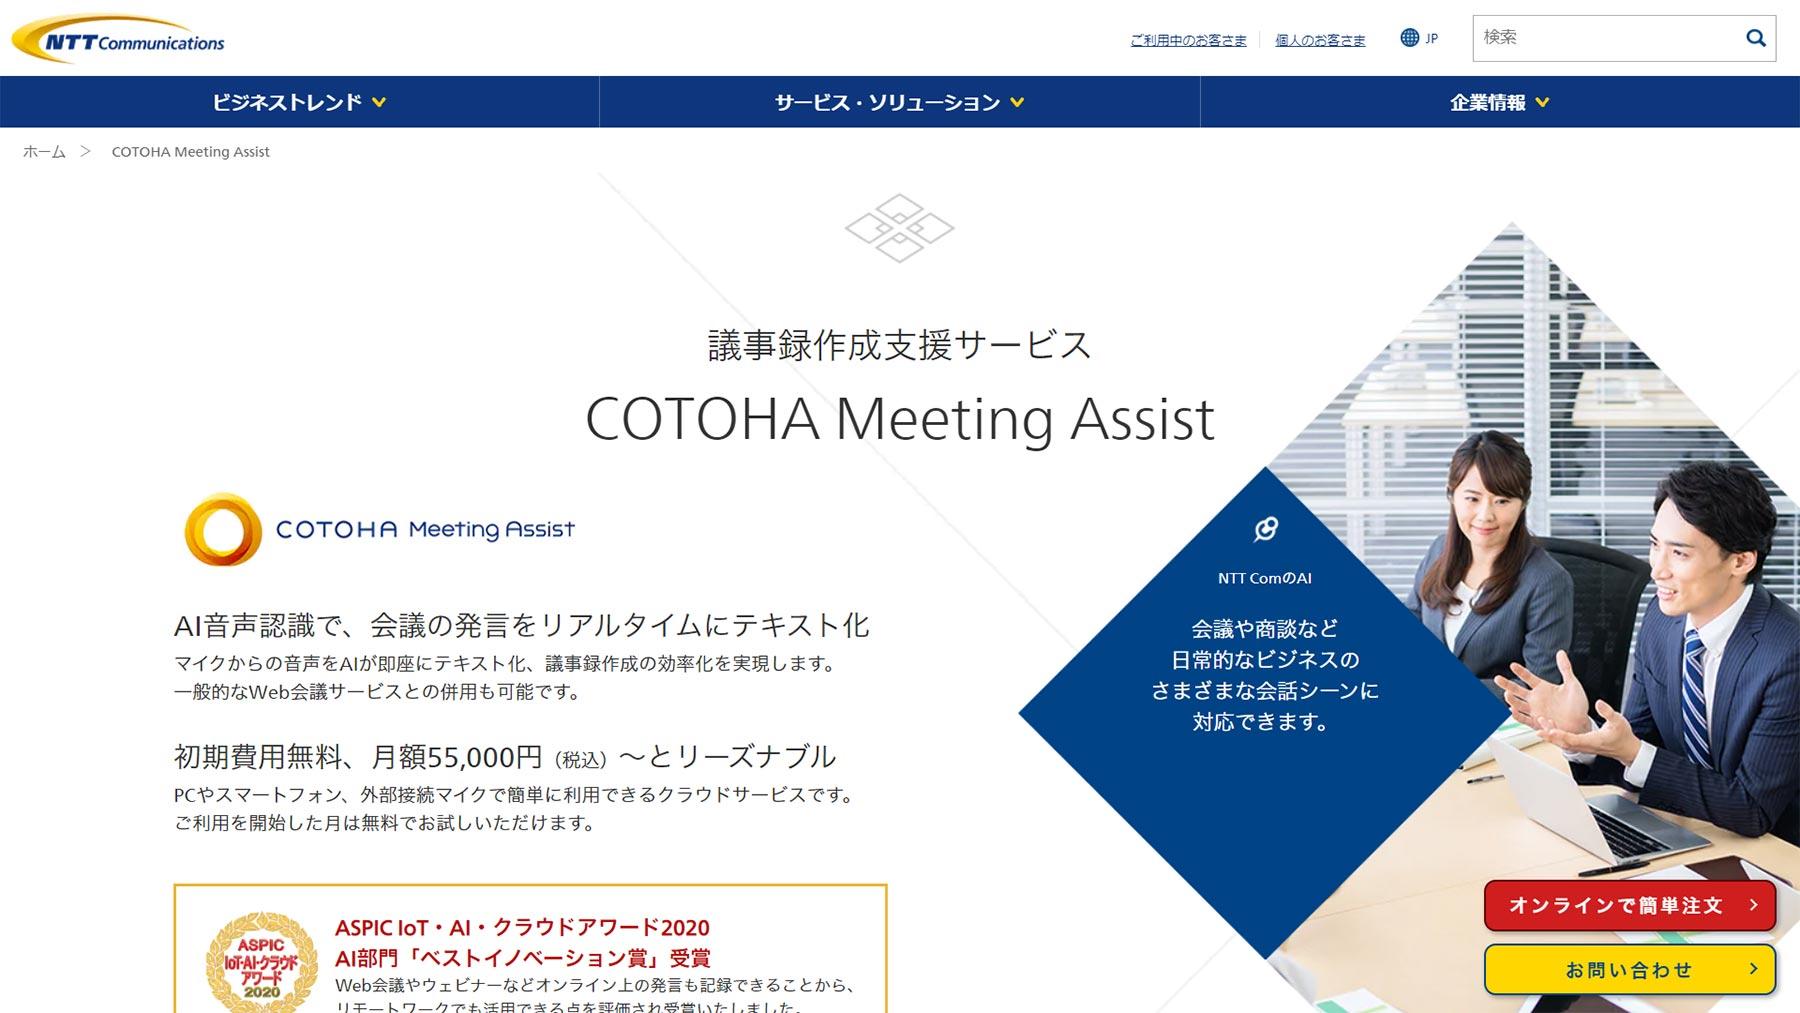 COTOHA Meeting Assist